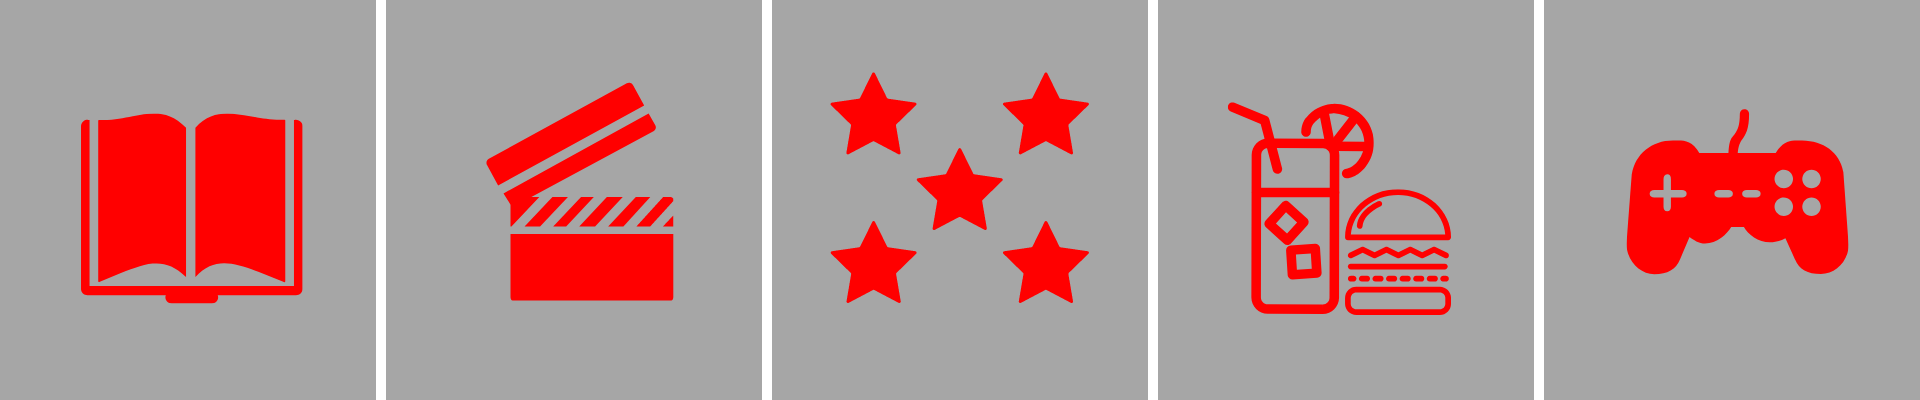 star stack header